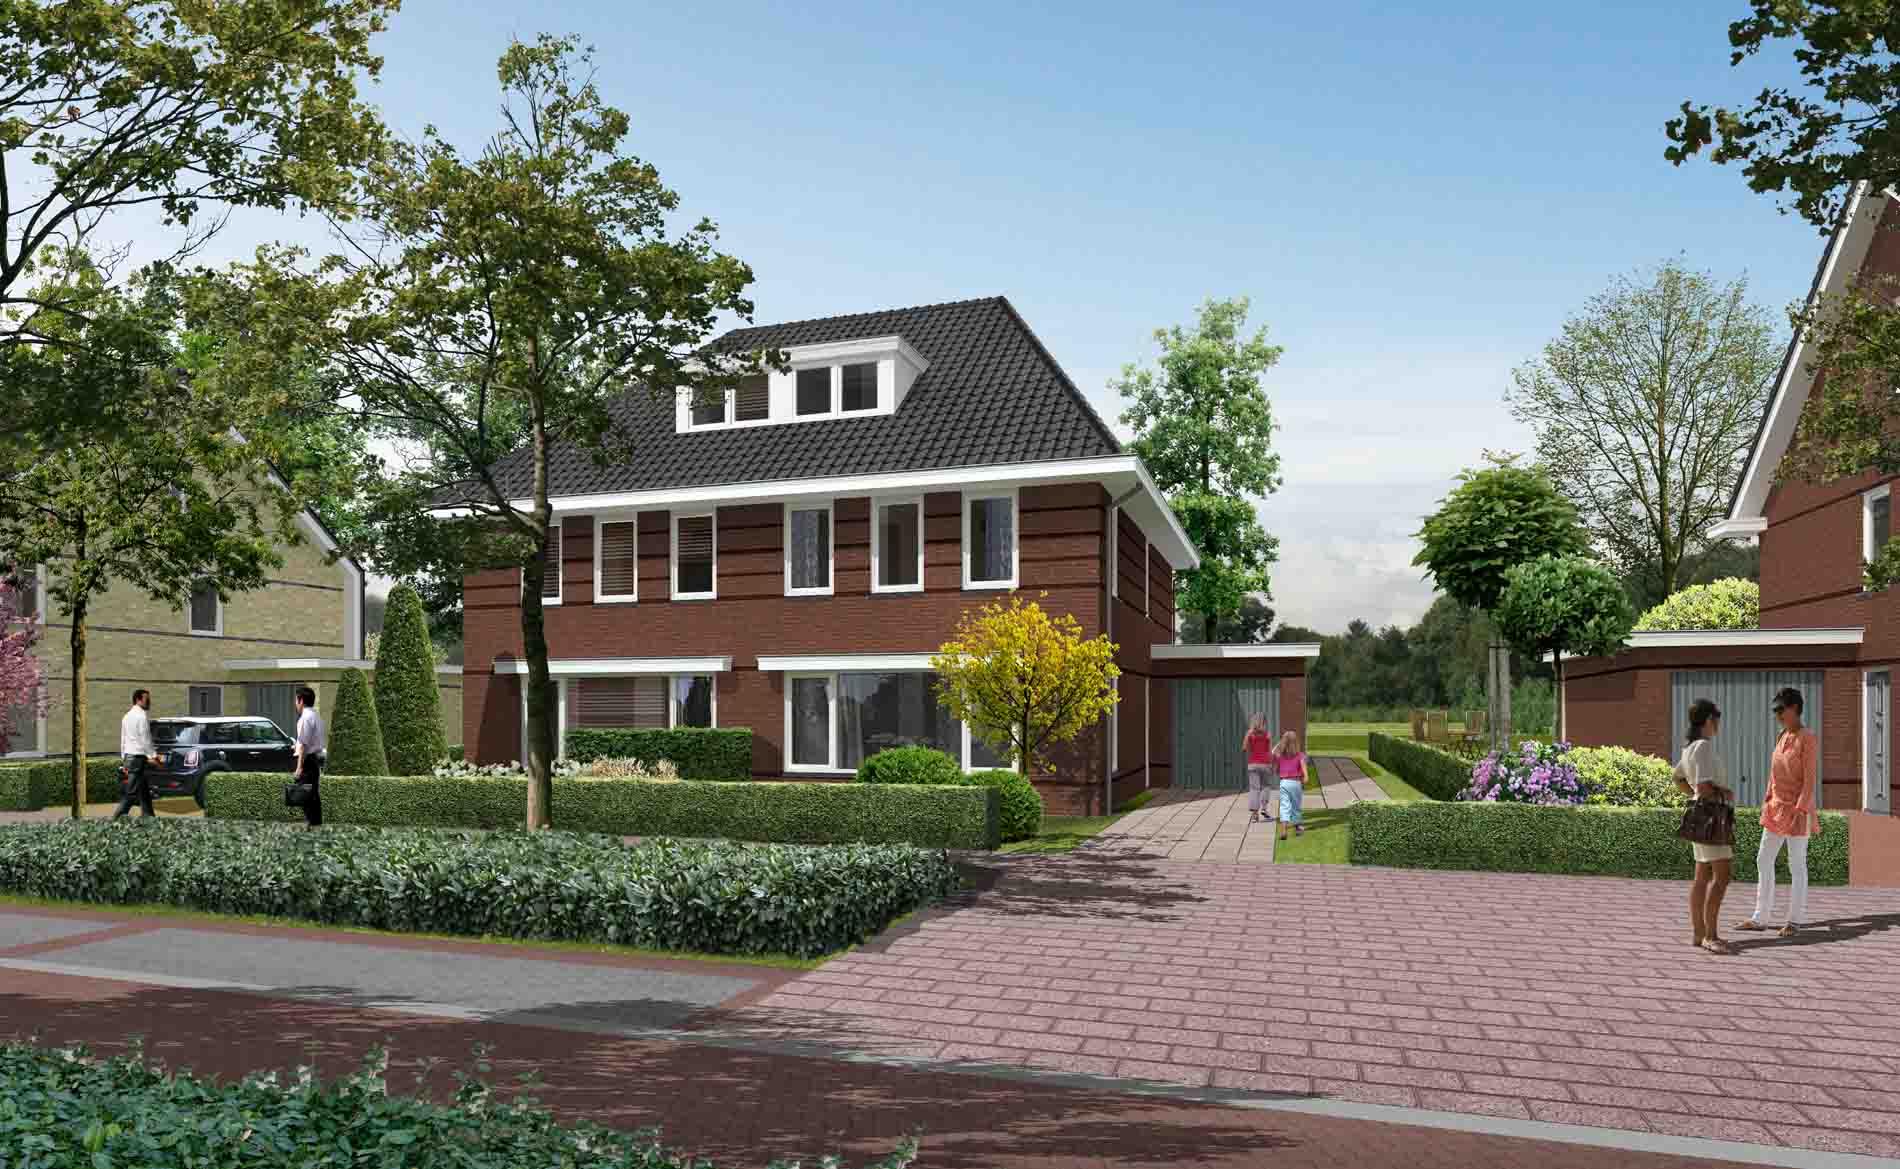 architect dorps wonen dorps bouwen woningbouw nieuwbouwwijk westerdel Langedijk BBHD architecten